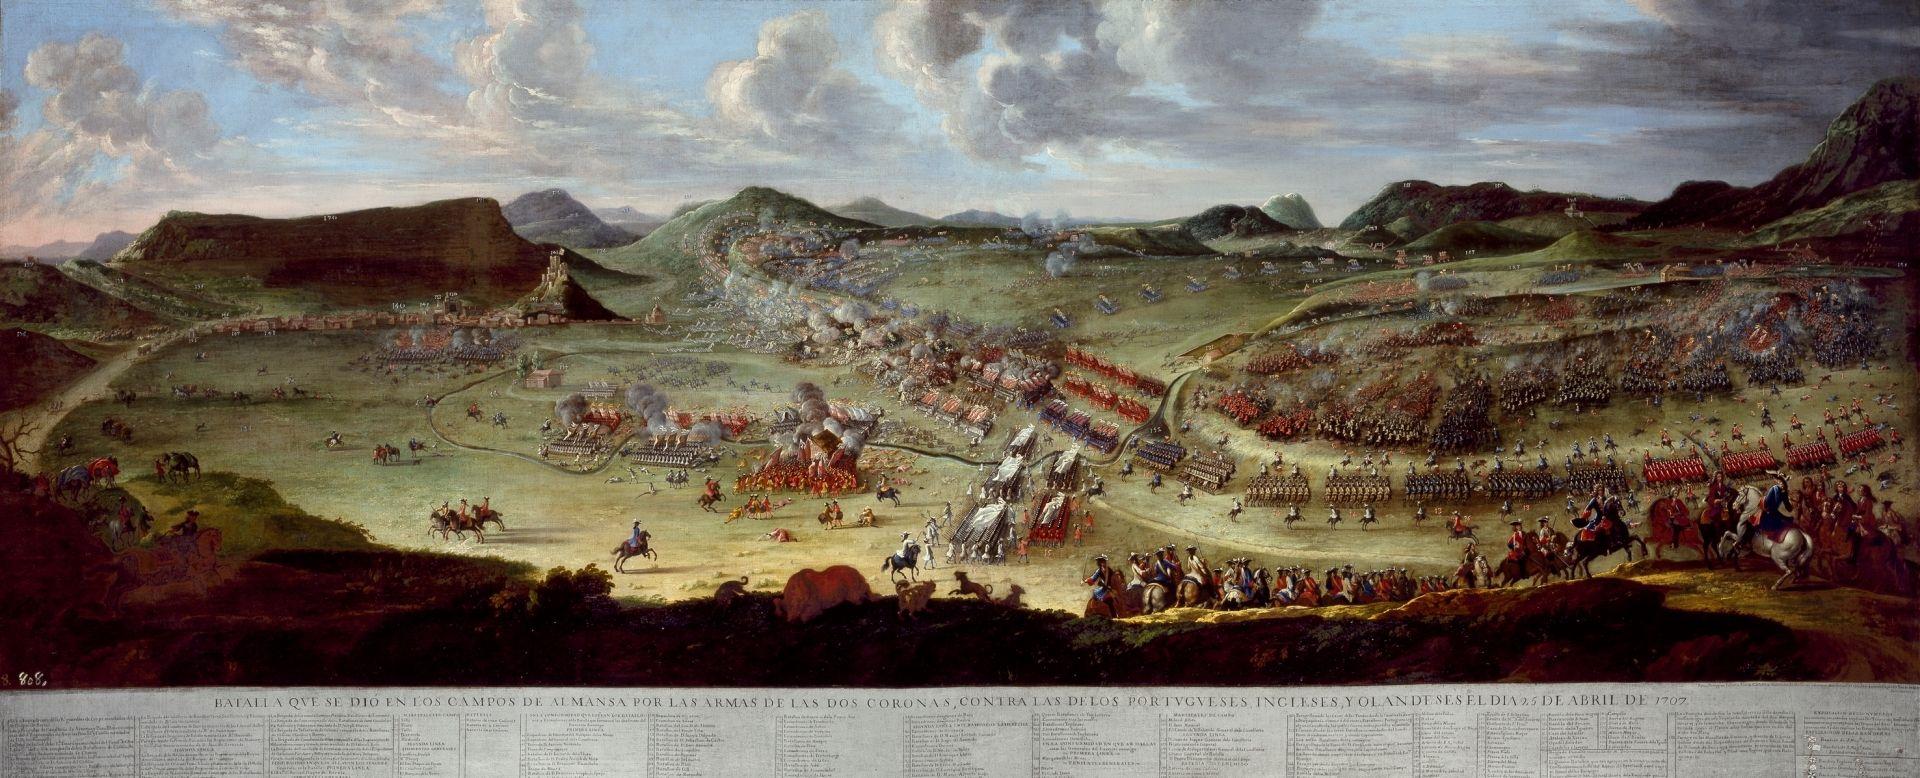 Batalla de Almansa. Pallotta Filippo, Ligli Buonaventura, 1721. Museo del Prado